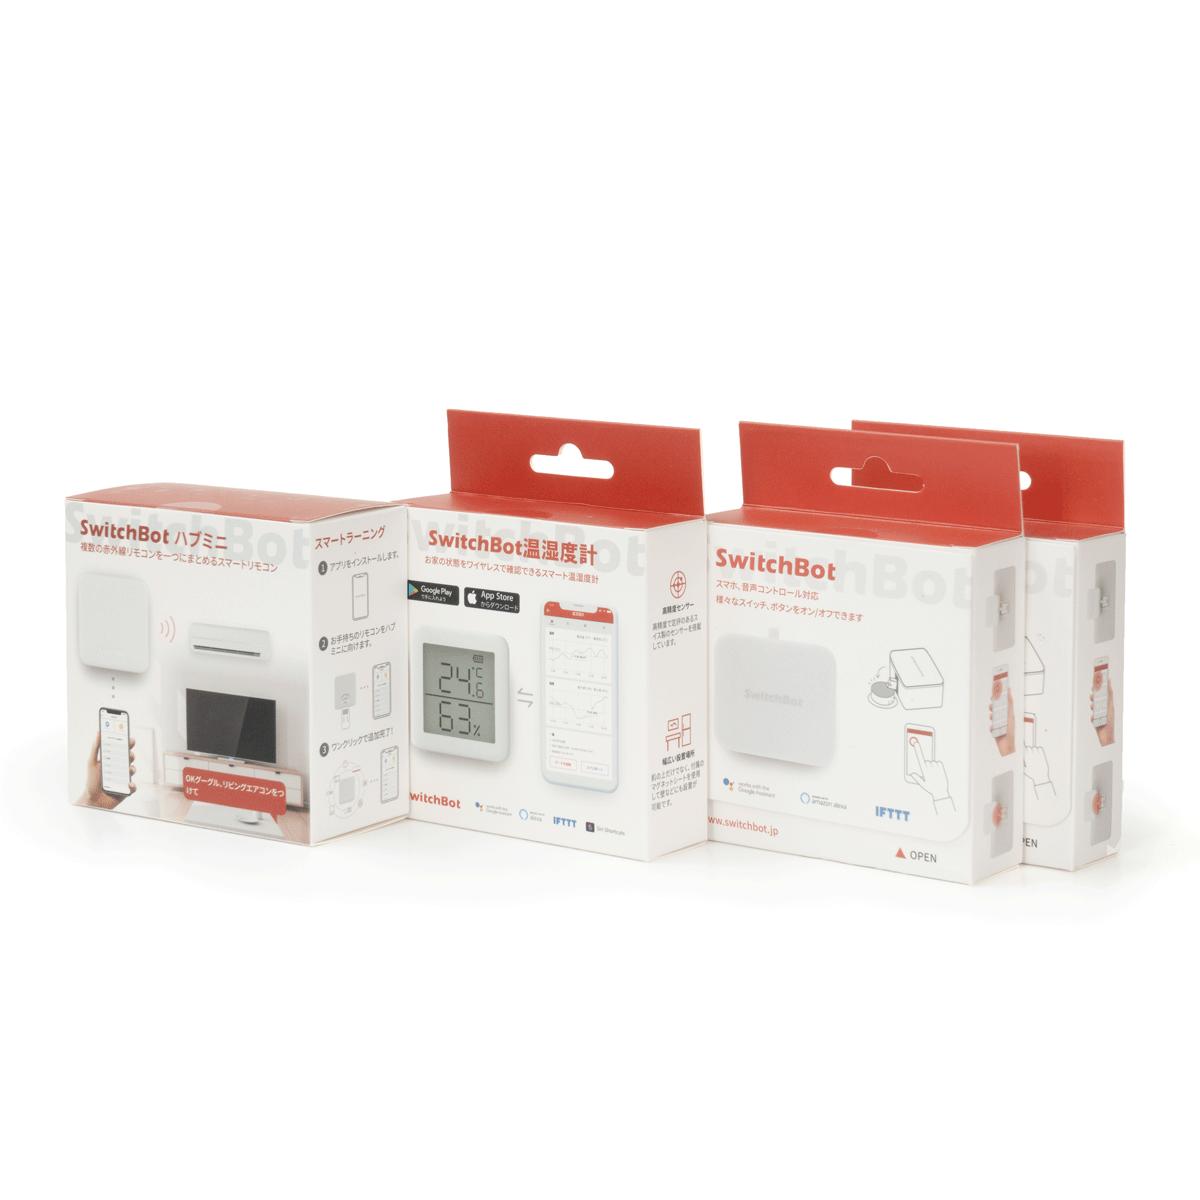 SwitchBot x2 + SwitchBotハブミニ(Hub Mini)+ SwitchBot温湿度計(Meter)セット